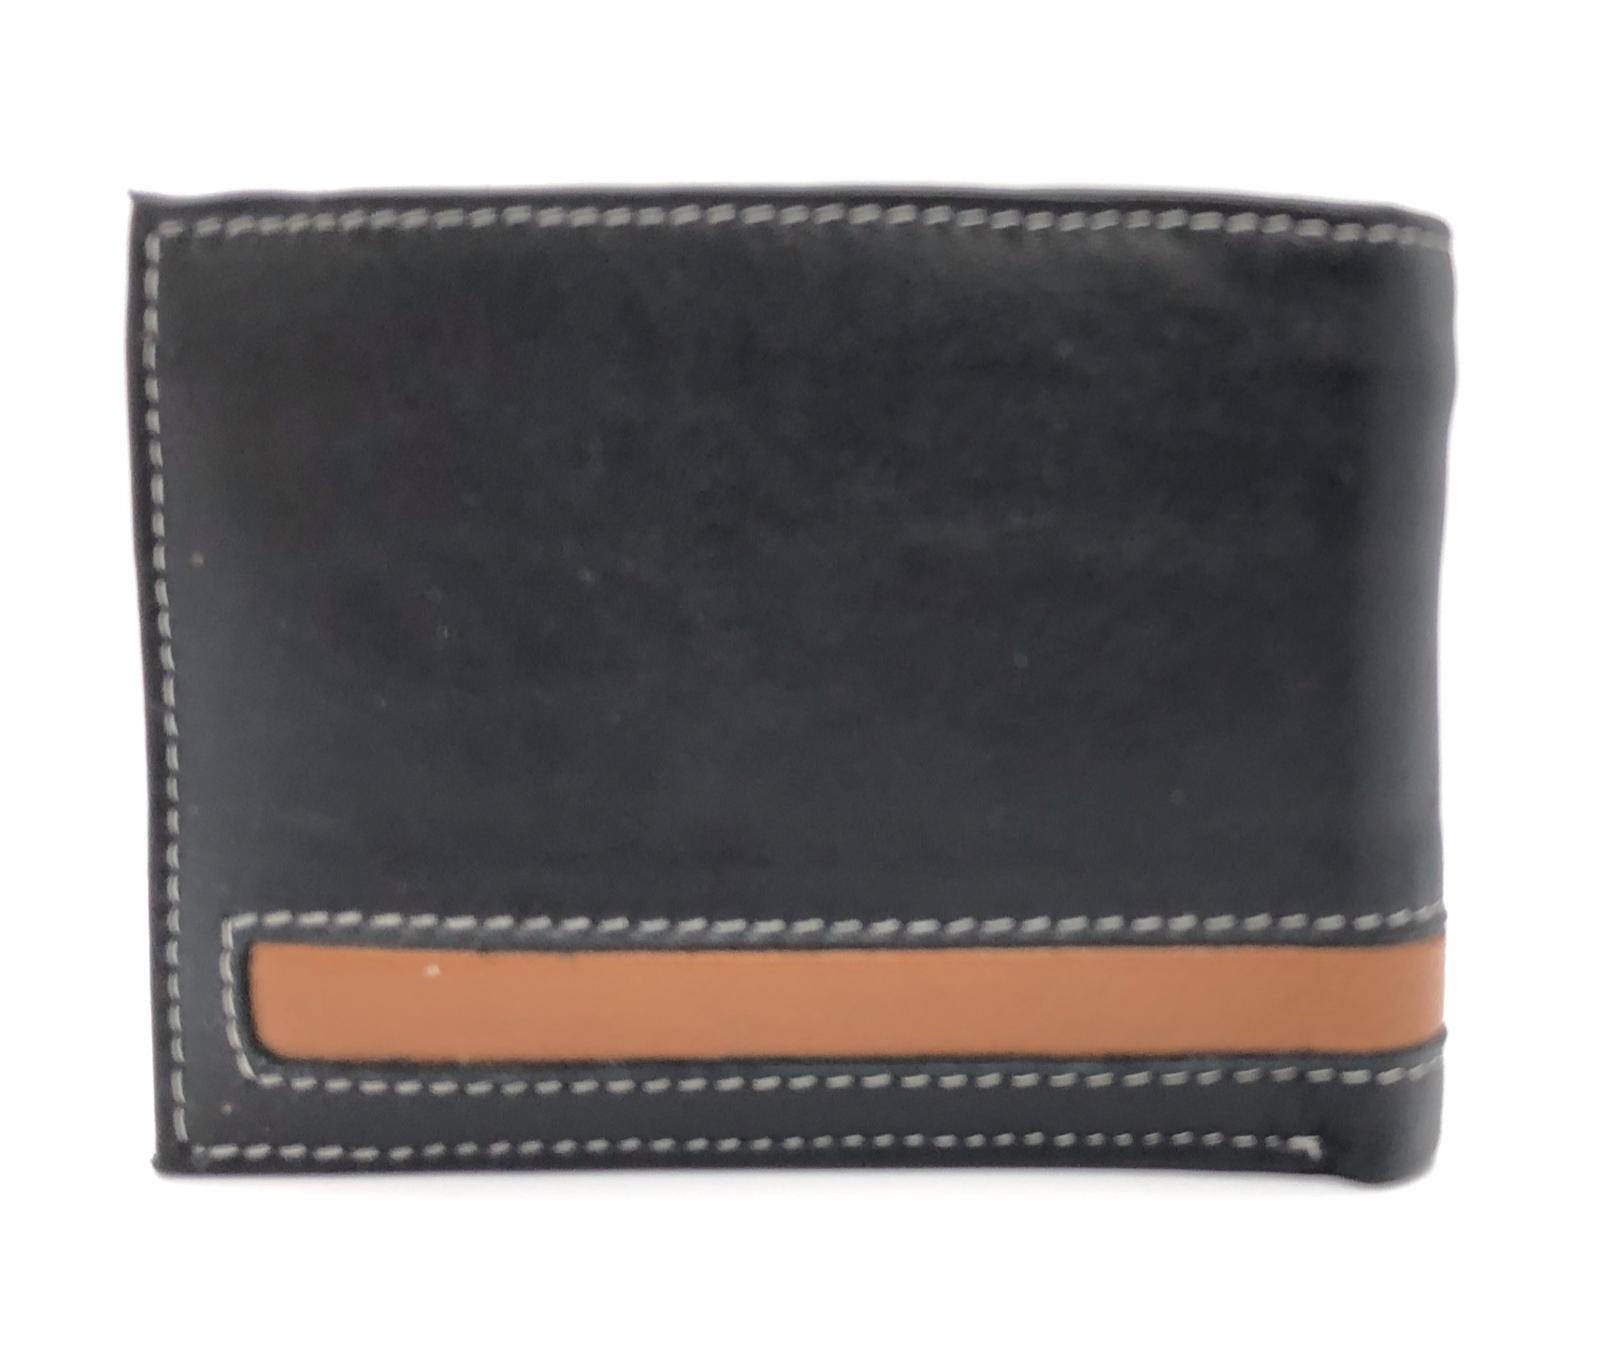 Black Handcrafted Premium Cowhide Genuine Leather Men's Bifold Wallet